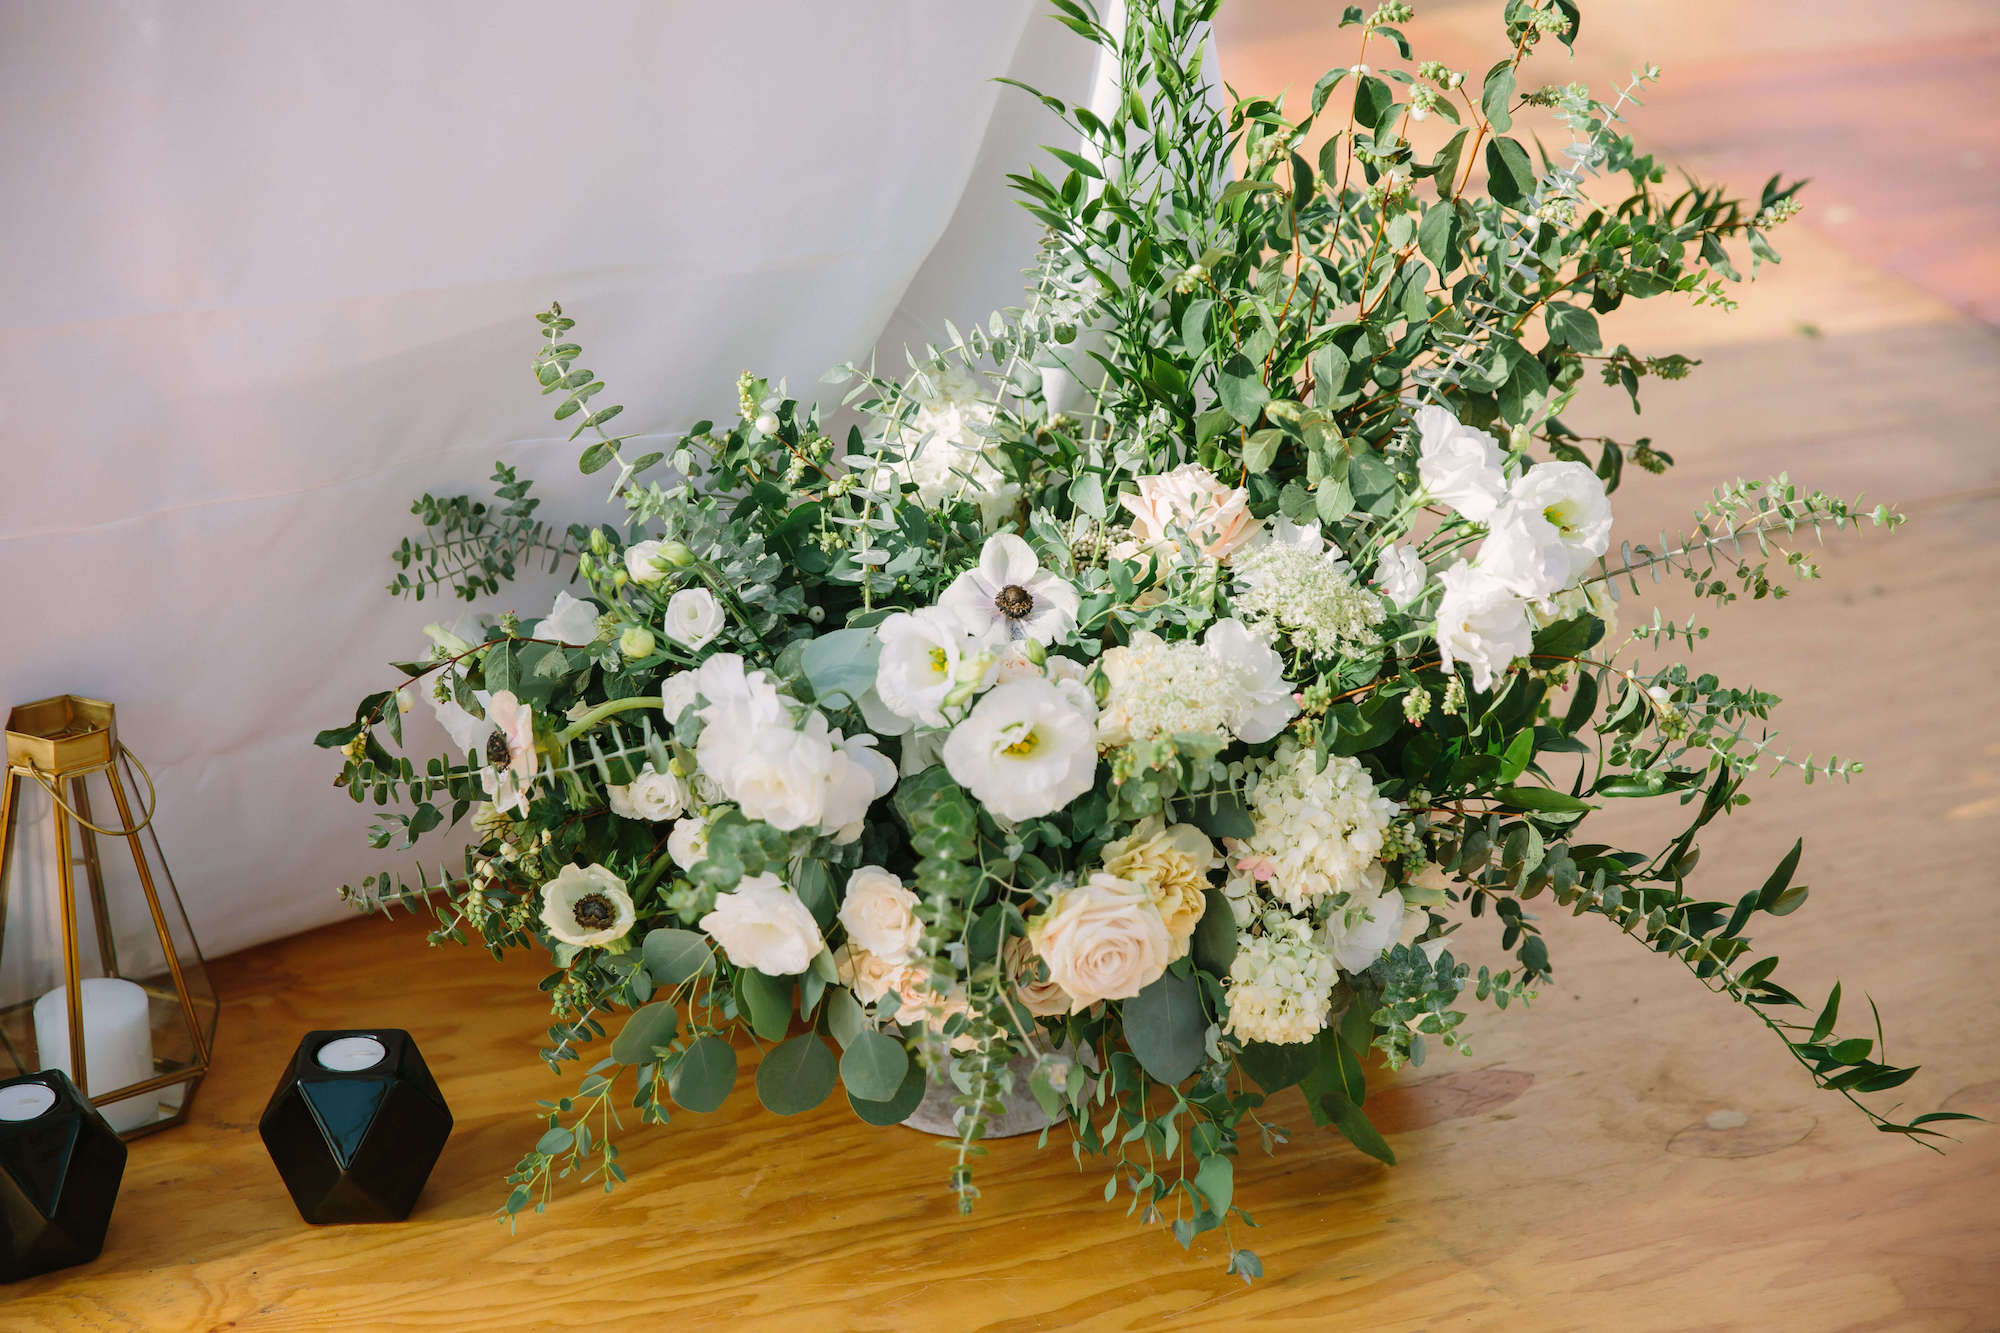 all-white-wedding-flowers-with-greenery.jpg